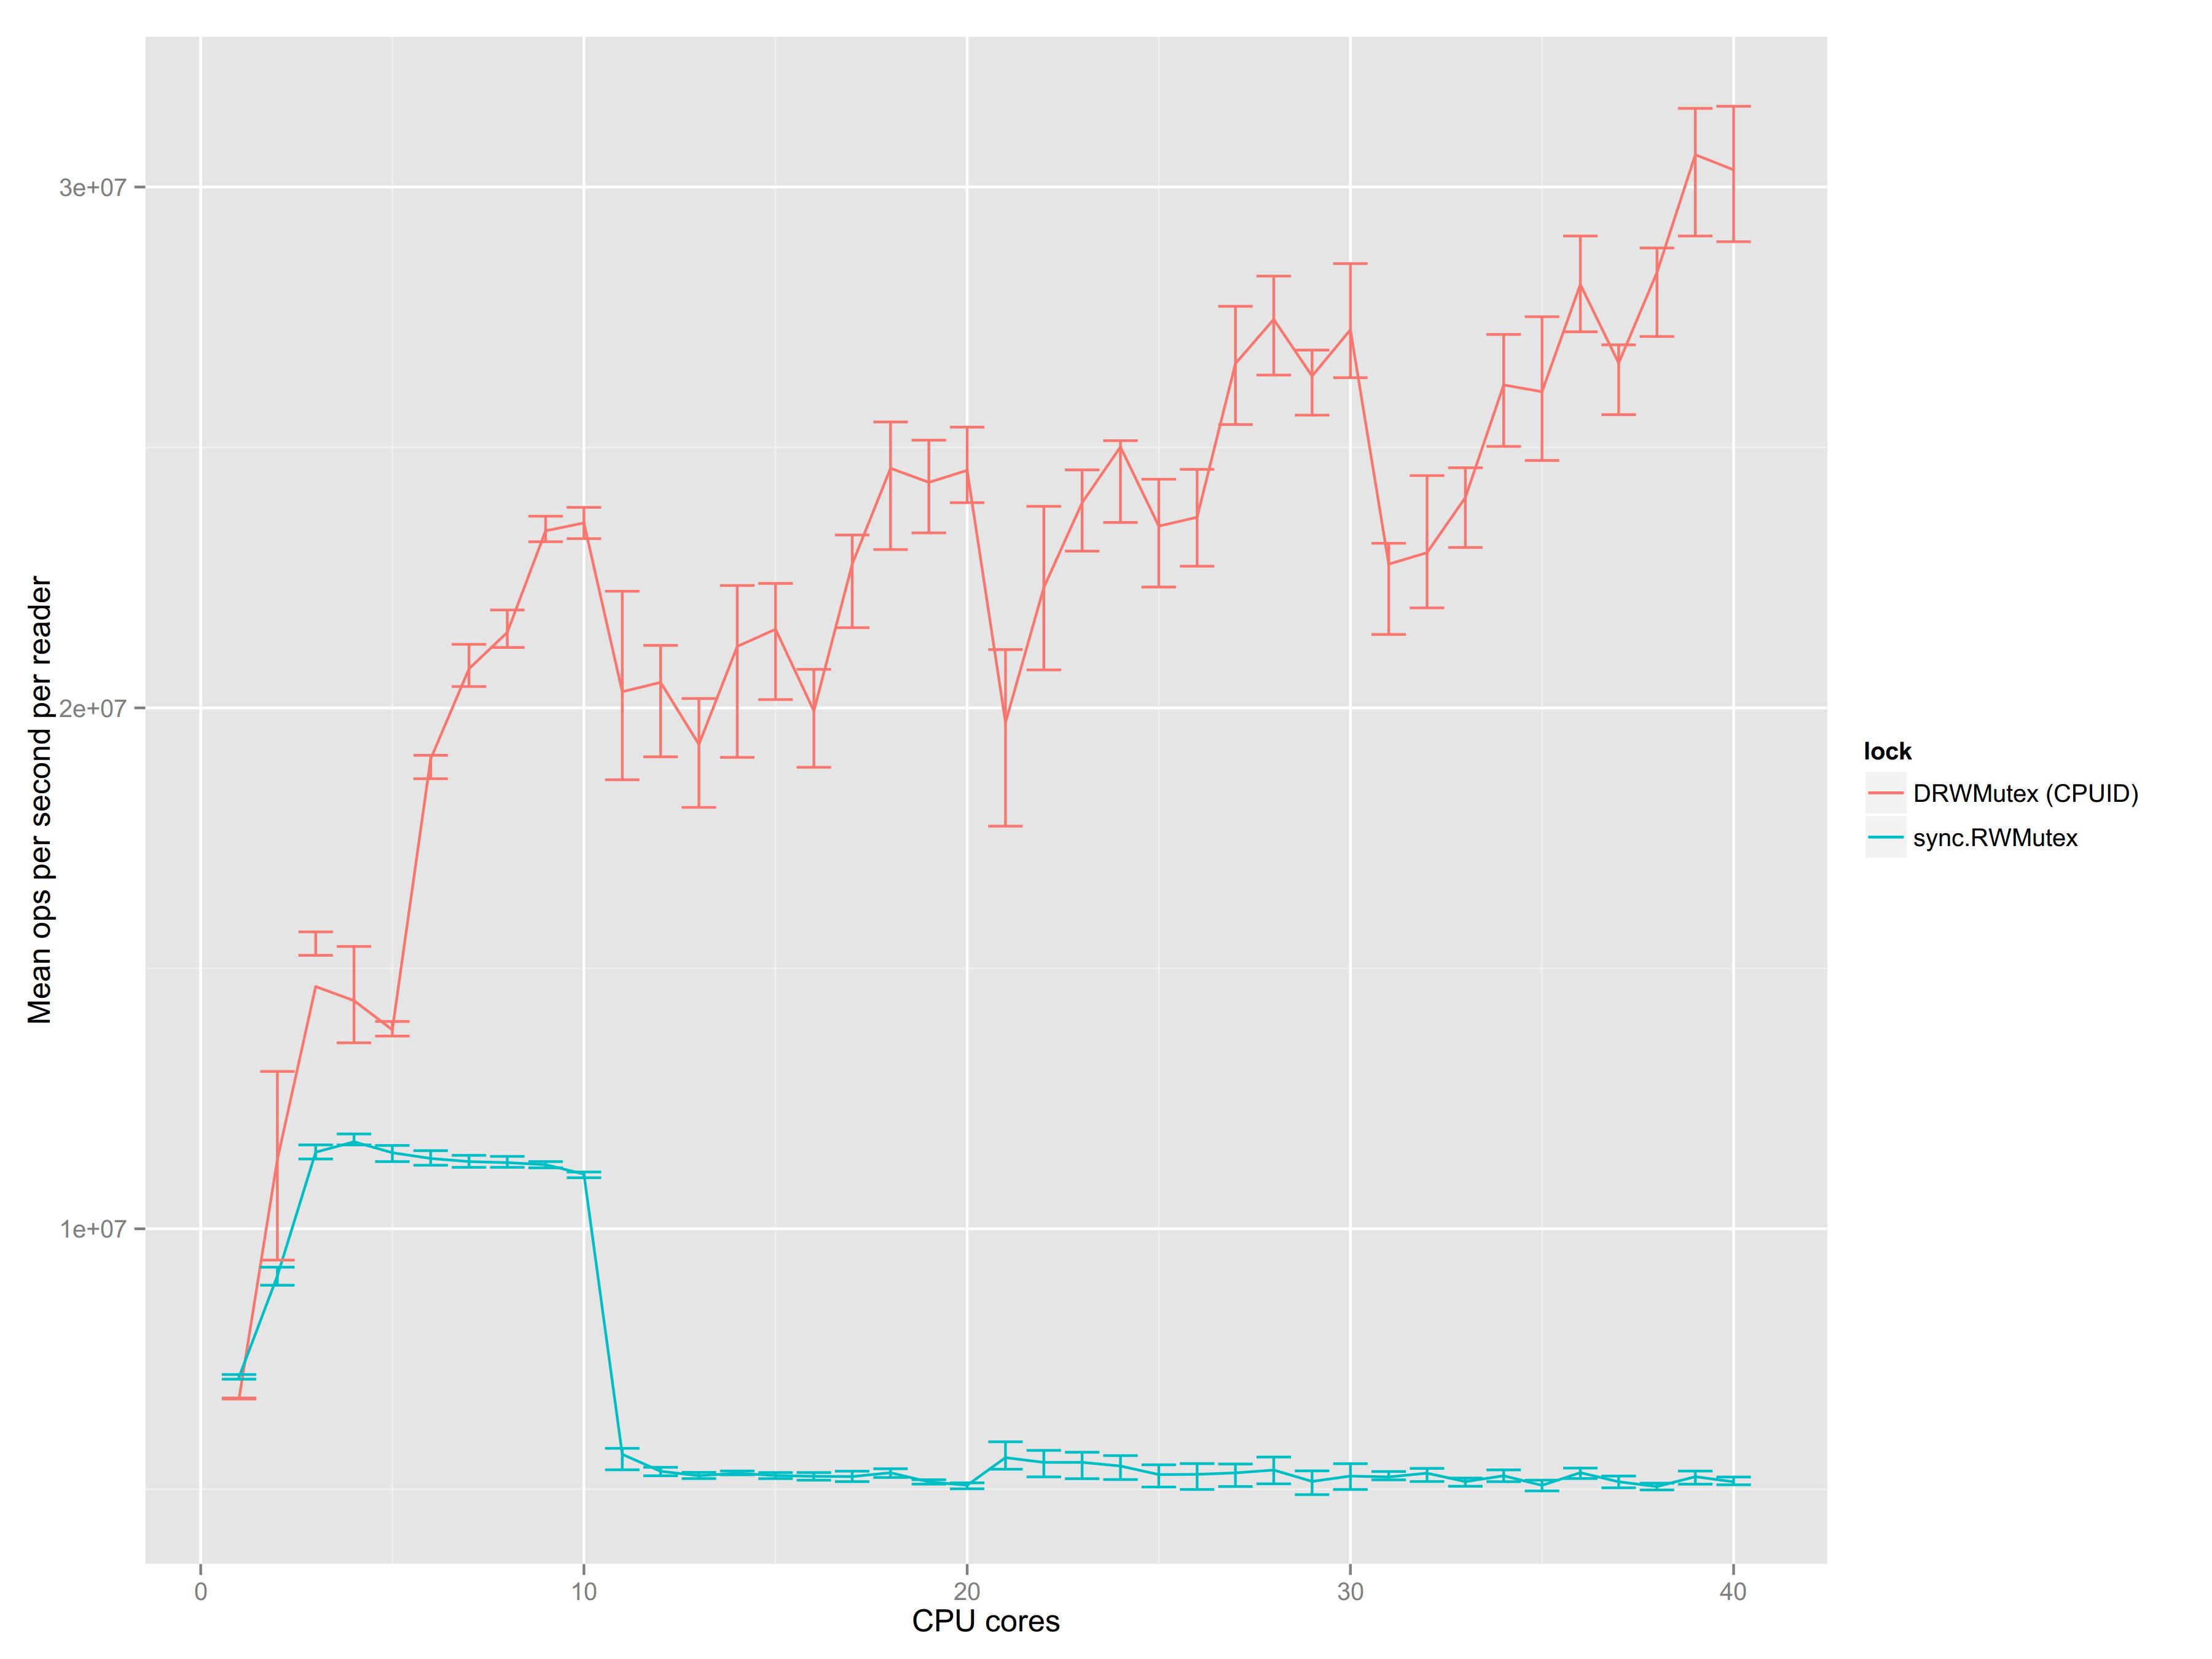 DRWMutex and sync.RWMutex performance comparison